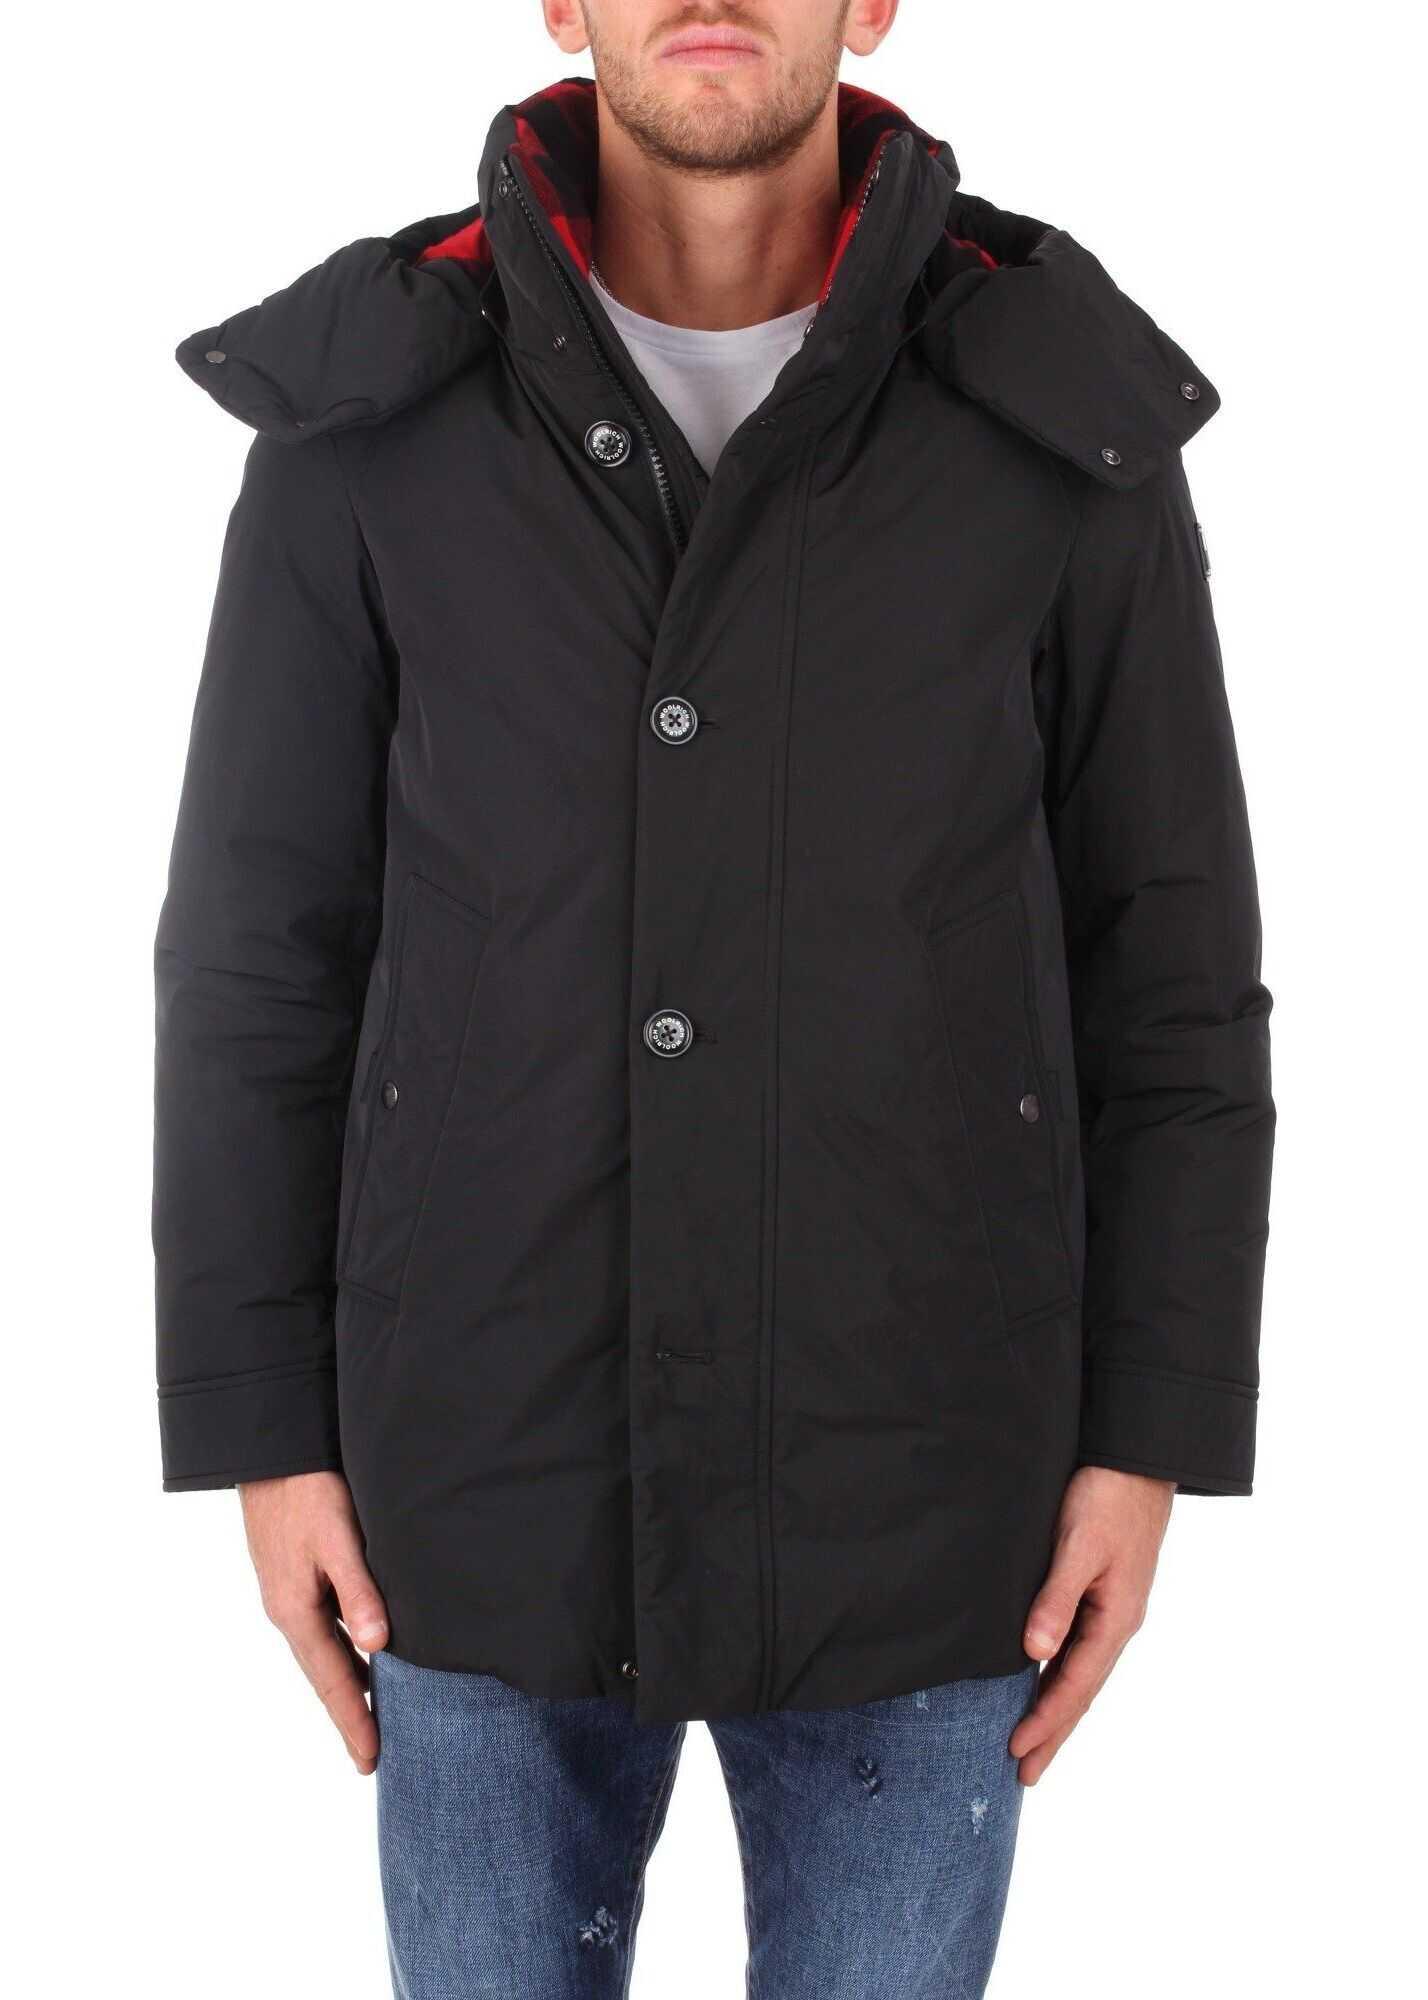 Woolrich Polyester Outerwear Jacket BLACK